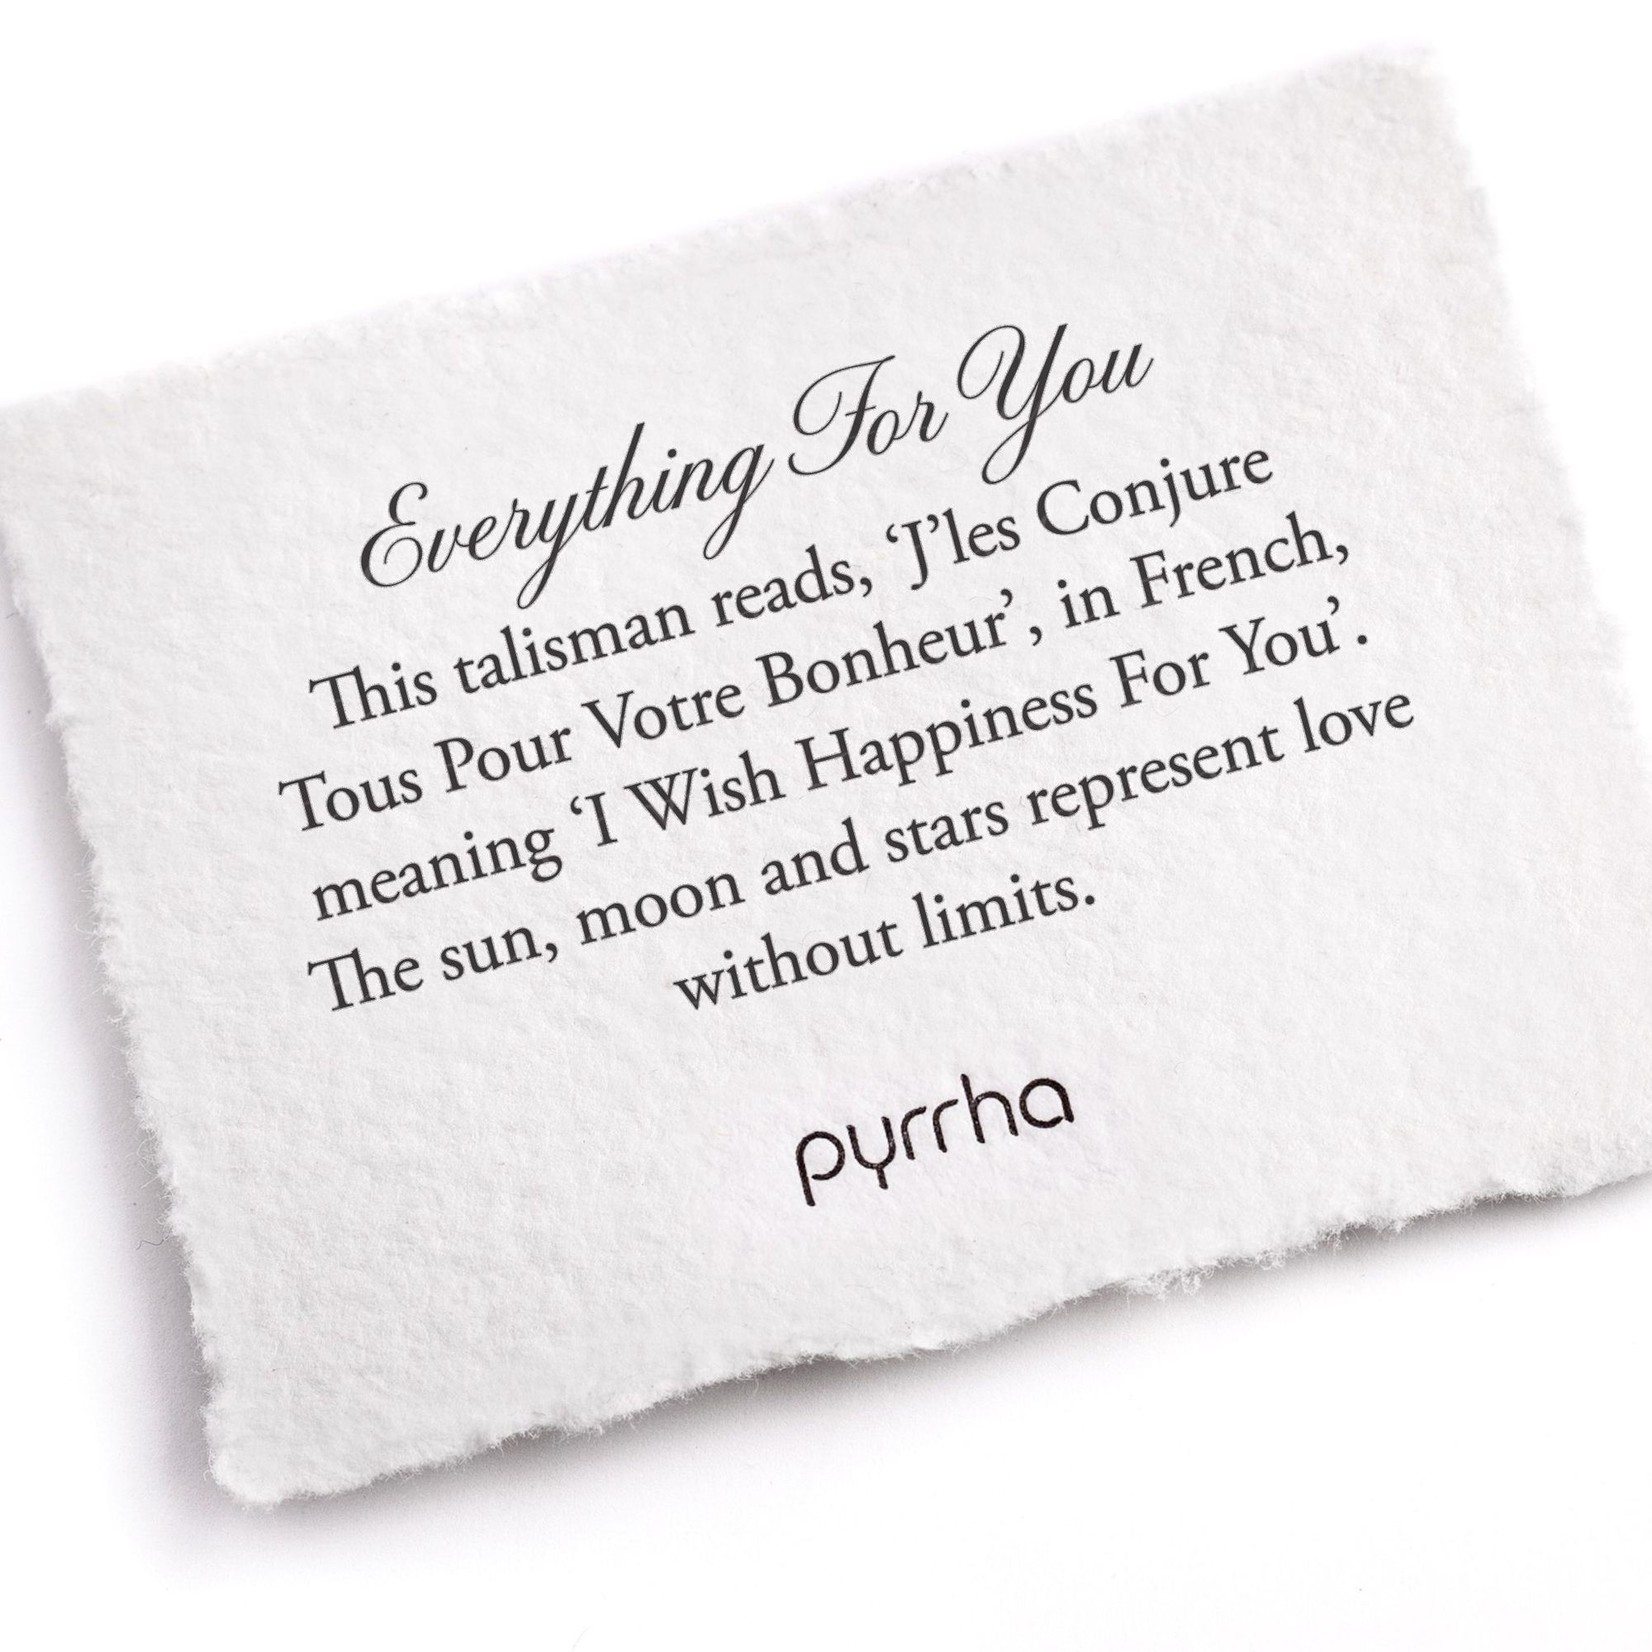 Pyrrha Everything for You Signature Talisman